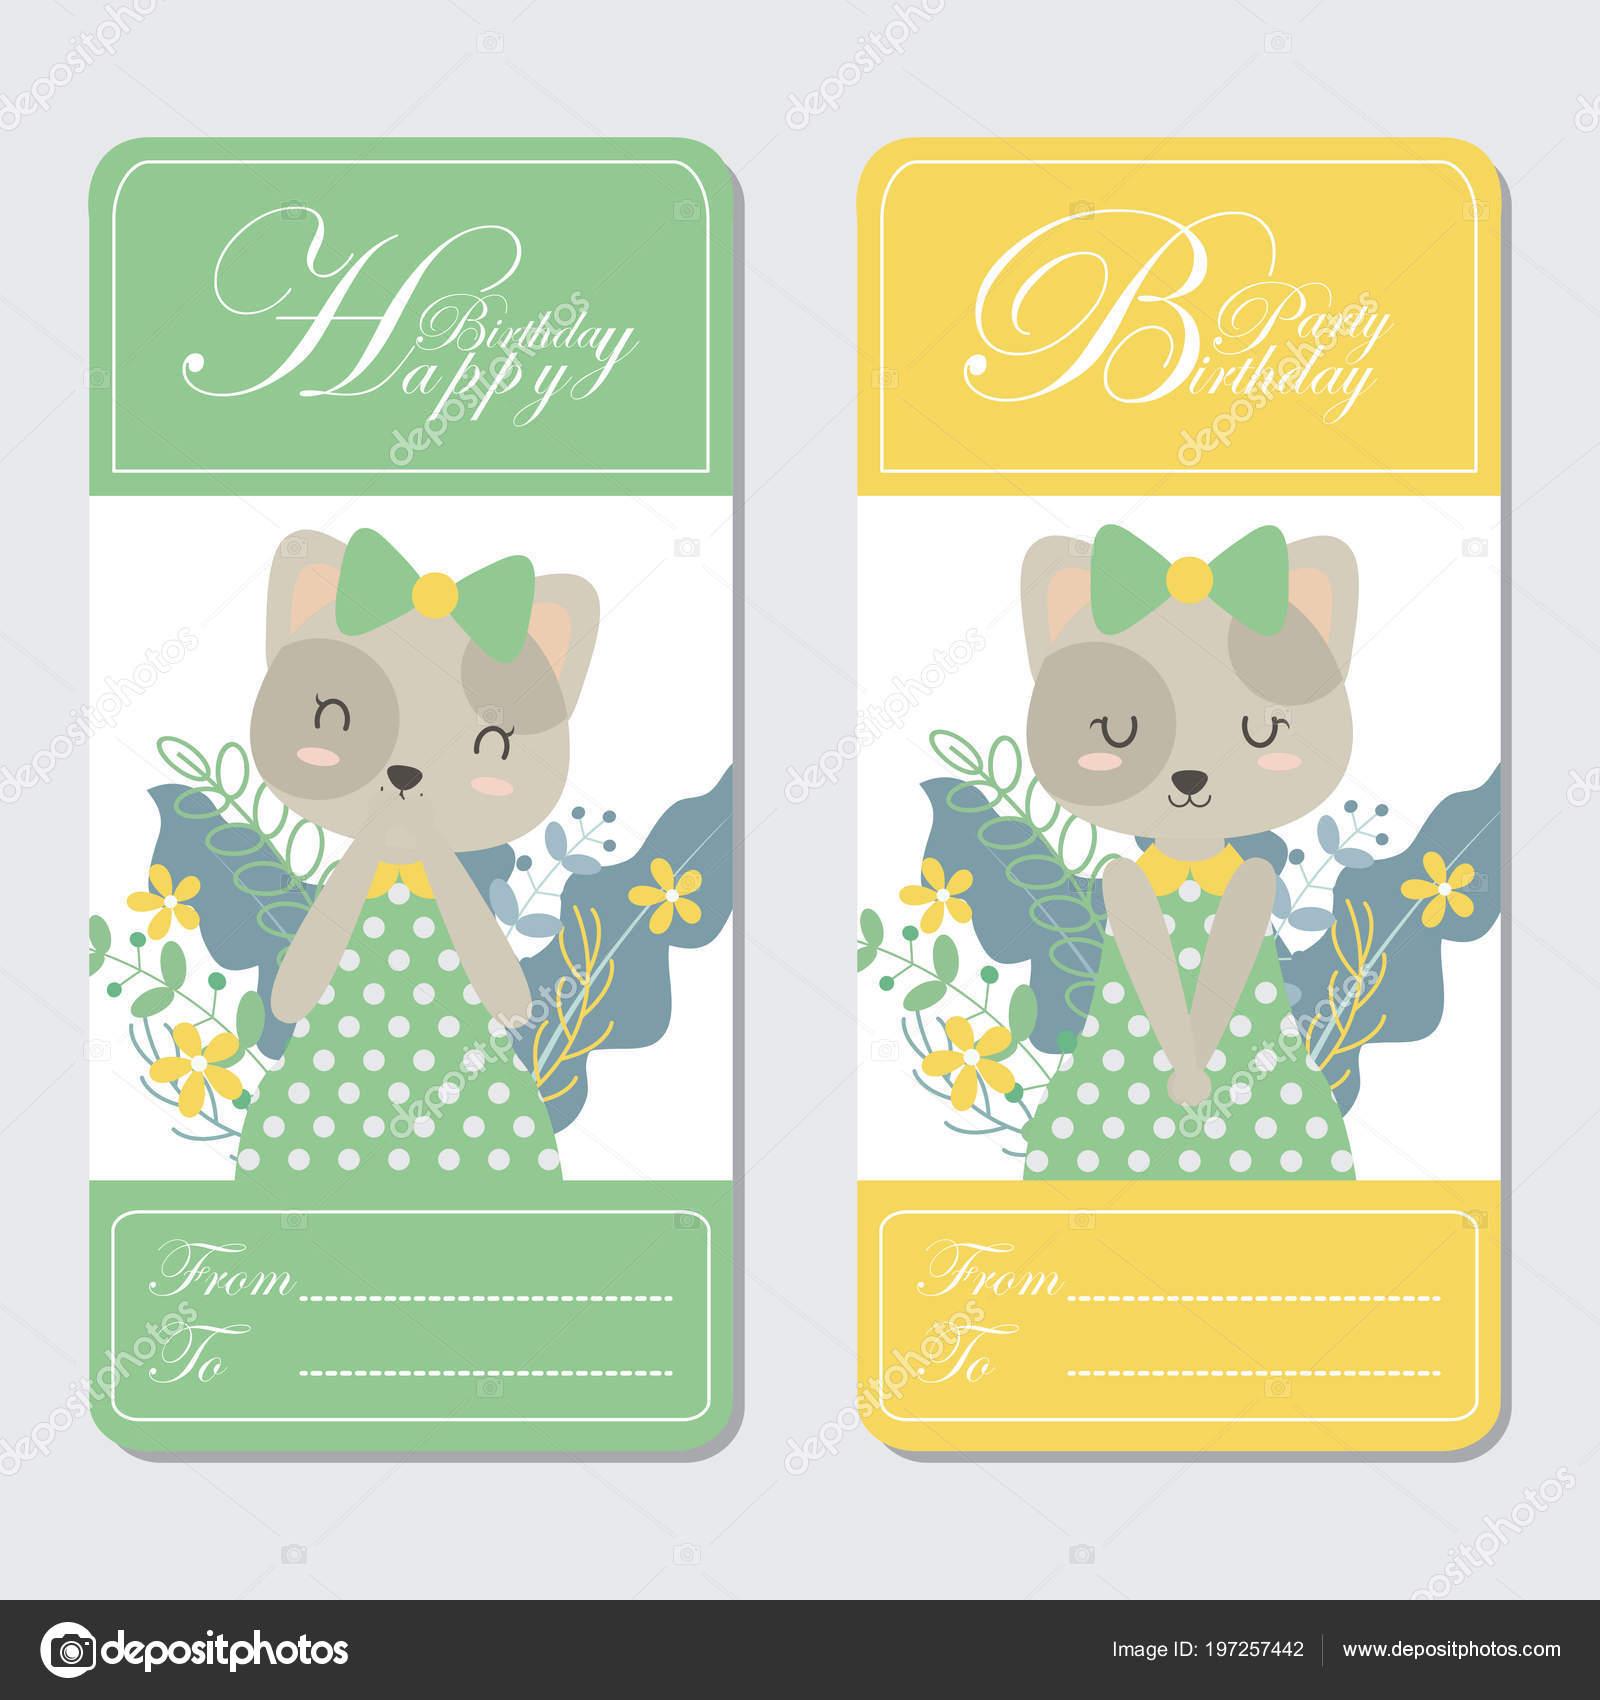 Vector Cartoon Illustration Cute Cat Flowers Suitable Birthday Card